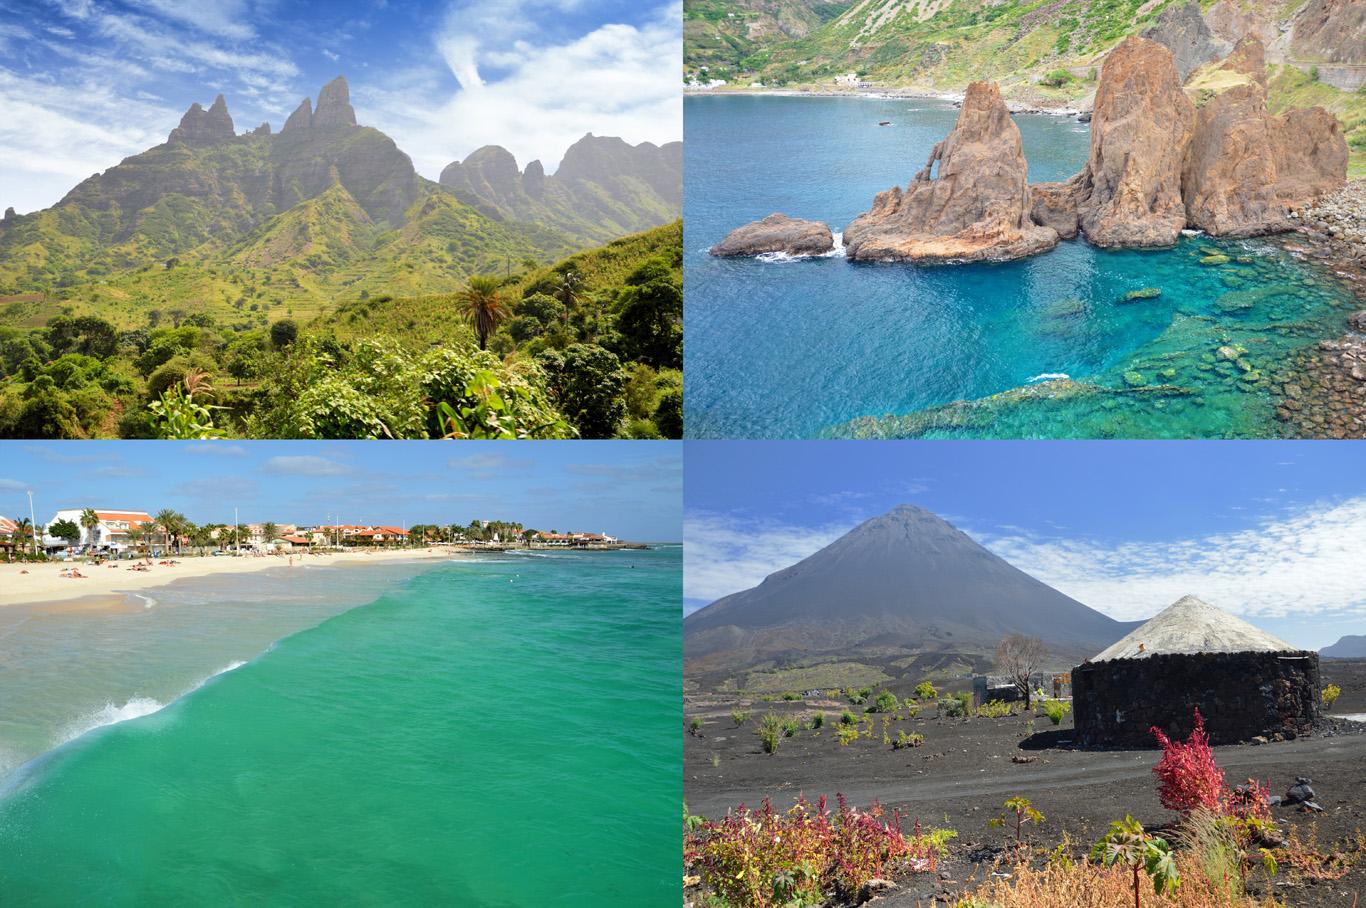 Cape Verde islands: Santiago, Brava, Sal and Fogo